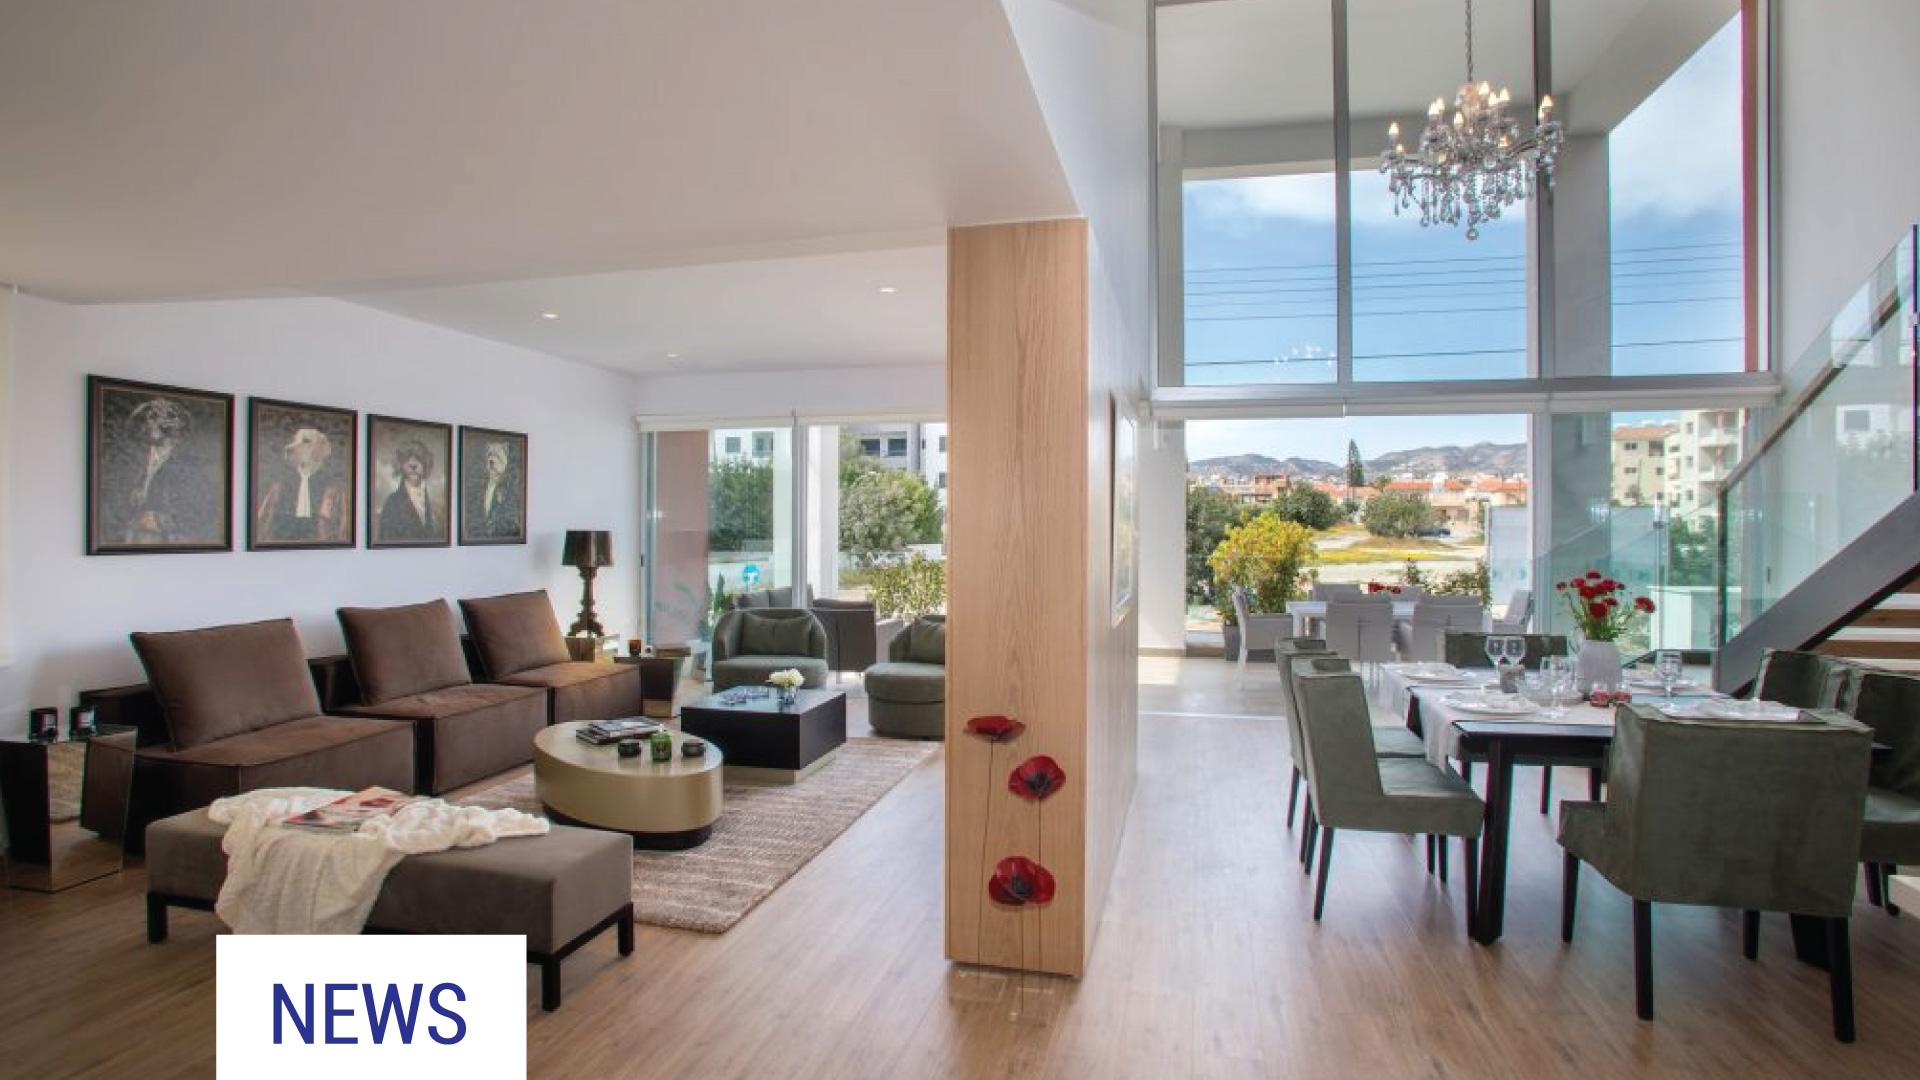 Cyprus Investment Scheme Improved